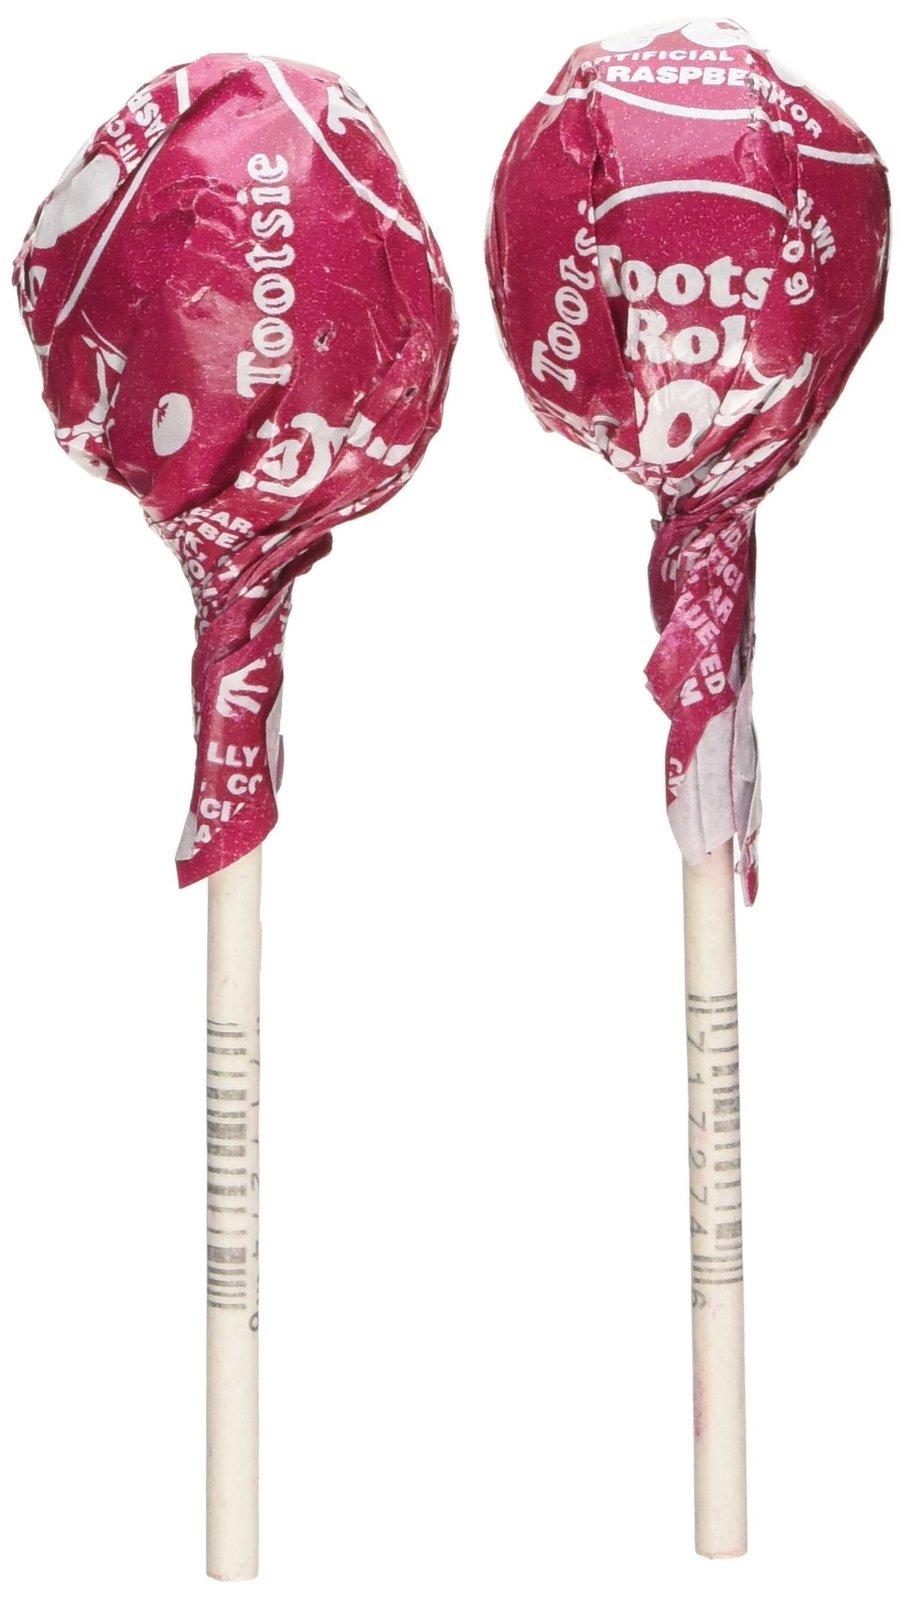 Red Raspberry Tootsie Pops 30 Pops - Hard Candy & Lollipops  Red Tootsie Pop